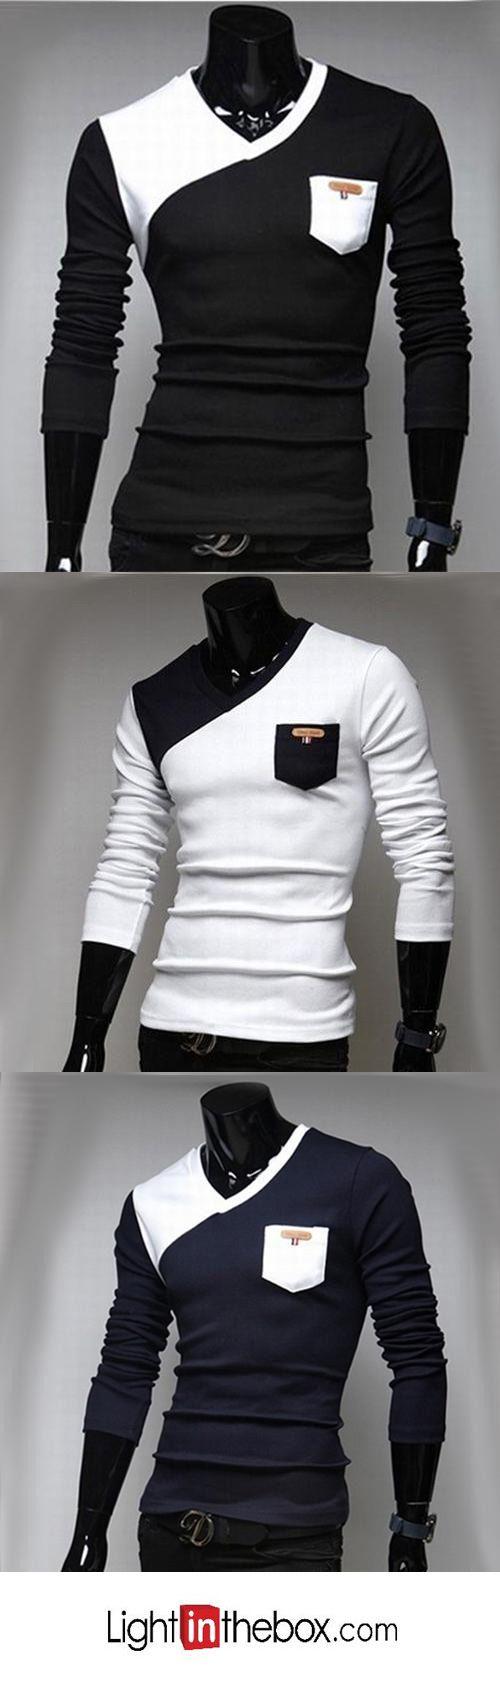 Men's Patchwork Black/White Casual V Neck Long Sleeve Pocket T-shirt